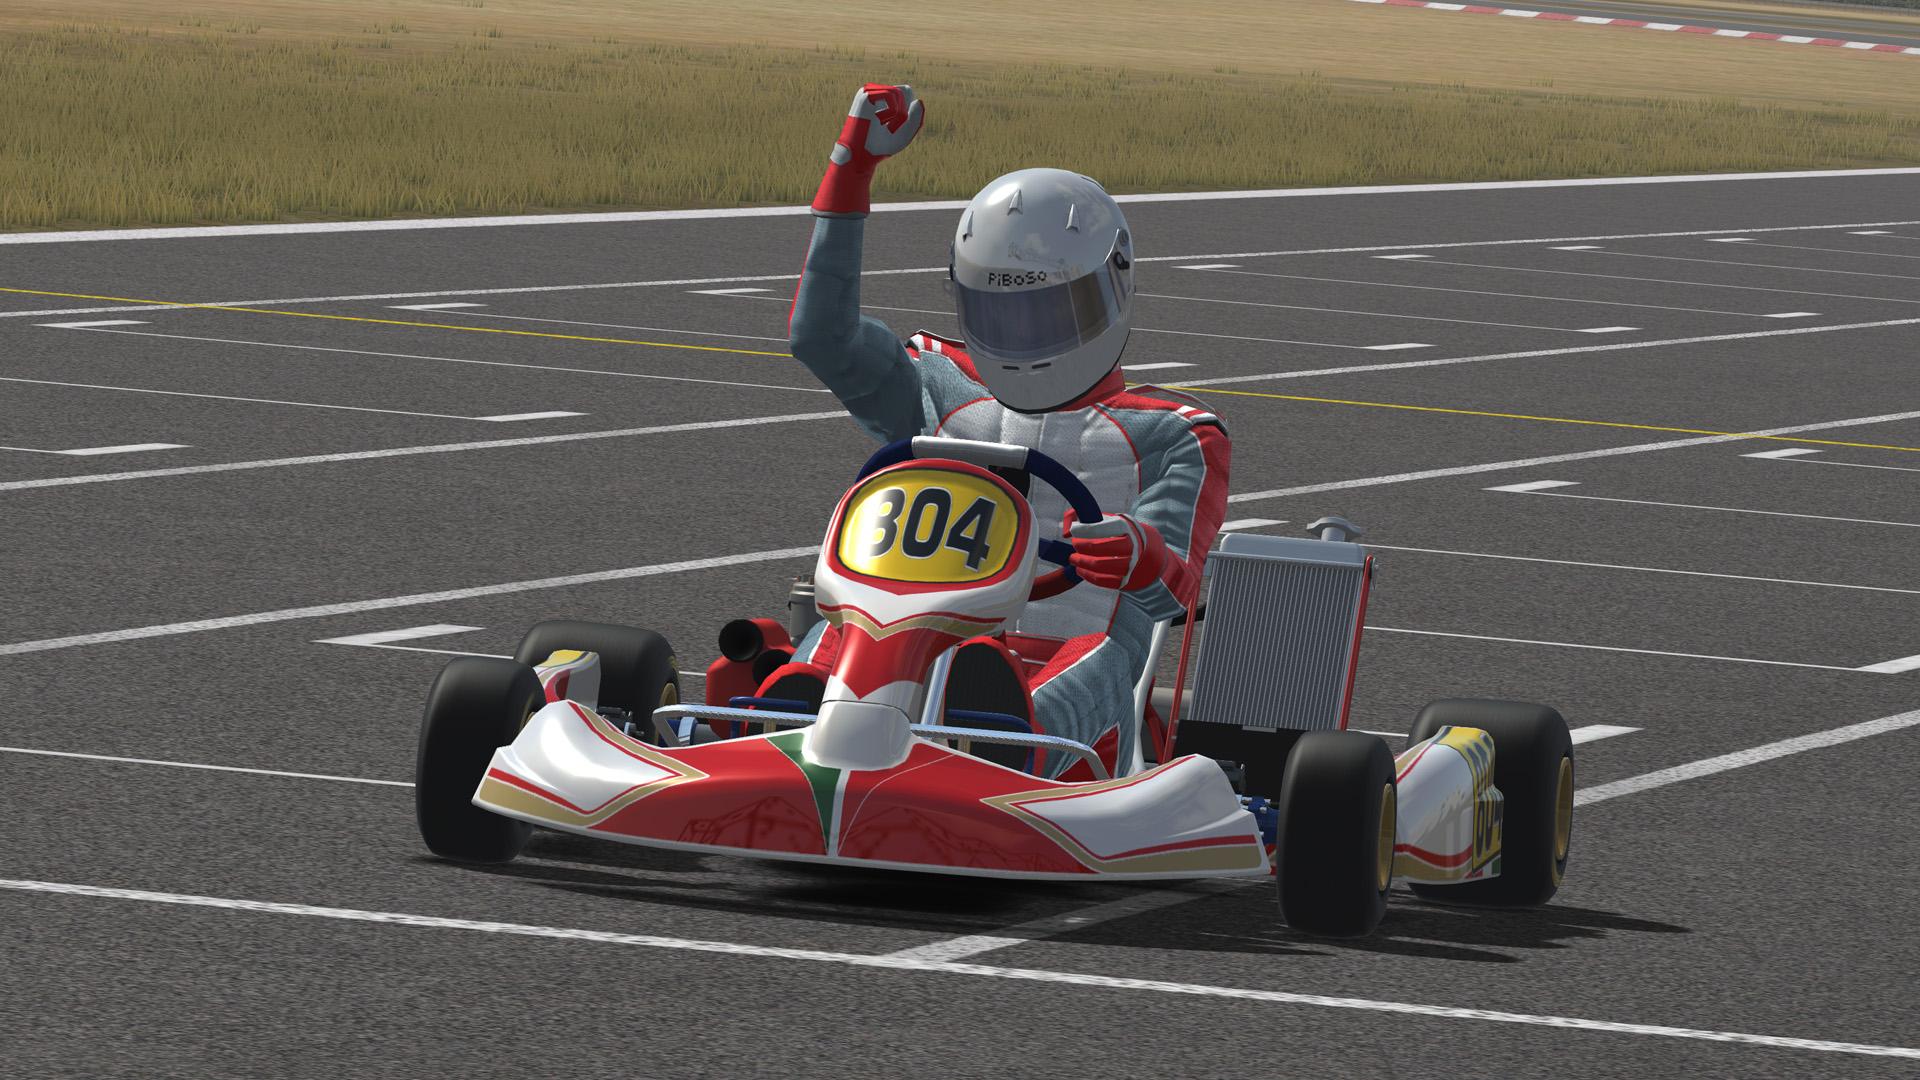 kart Kart Racing PRO Release 5 Update Deployed | RaceDepartment kart